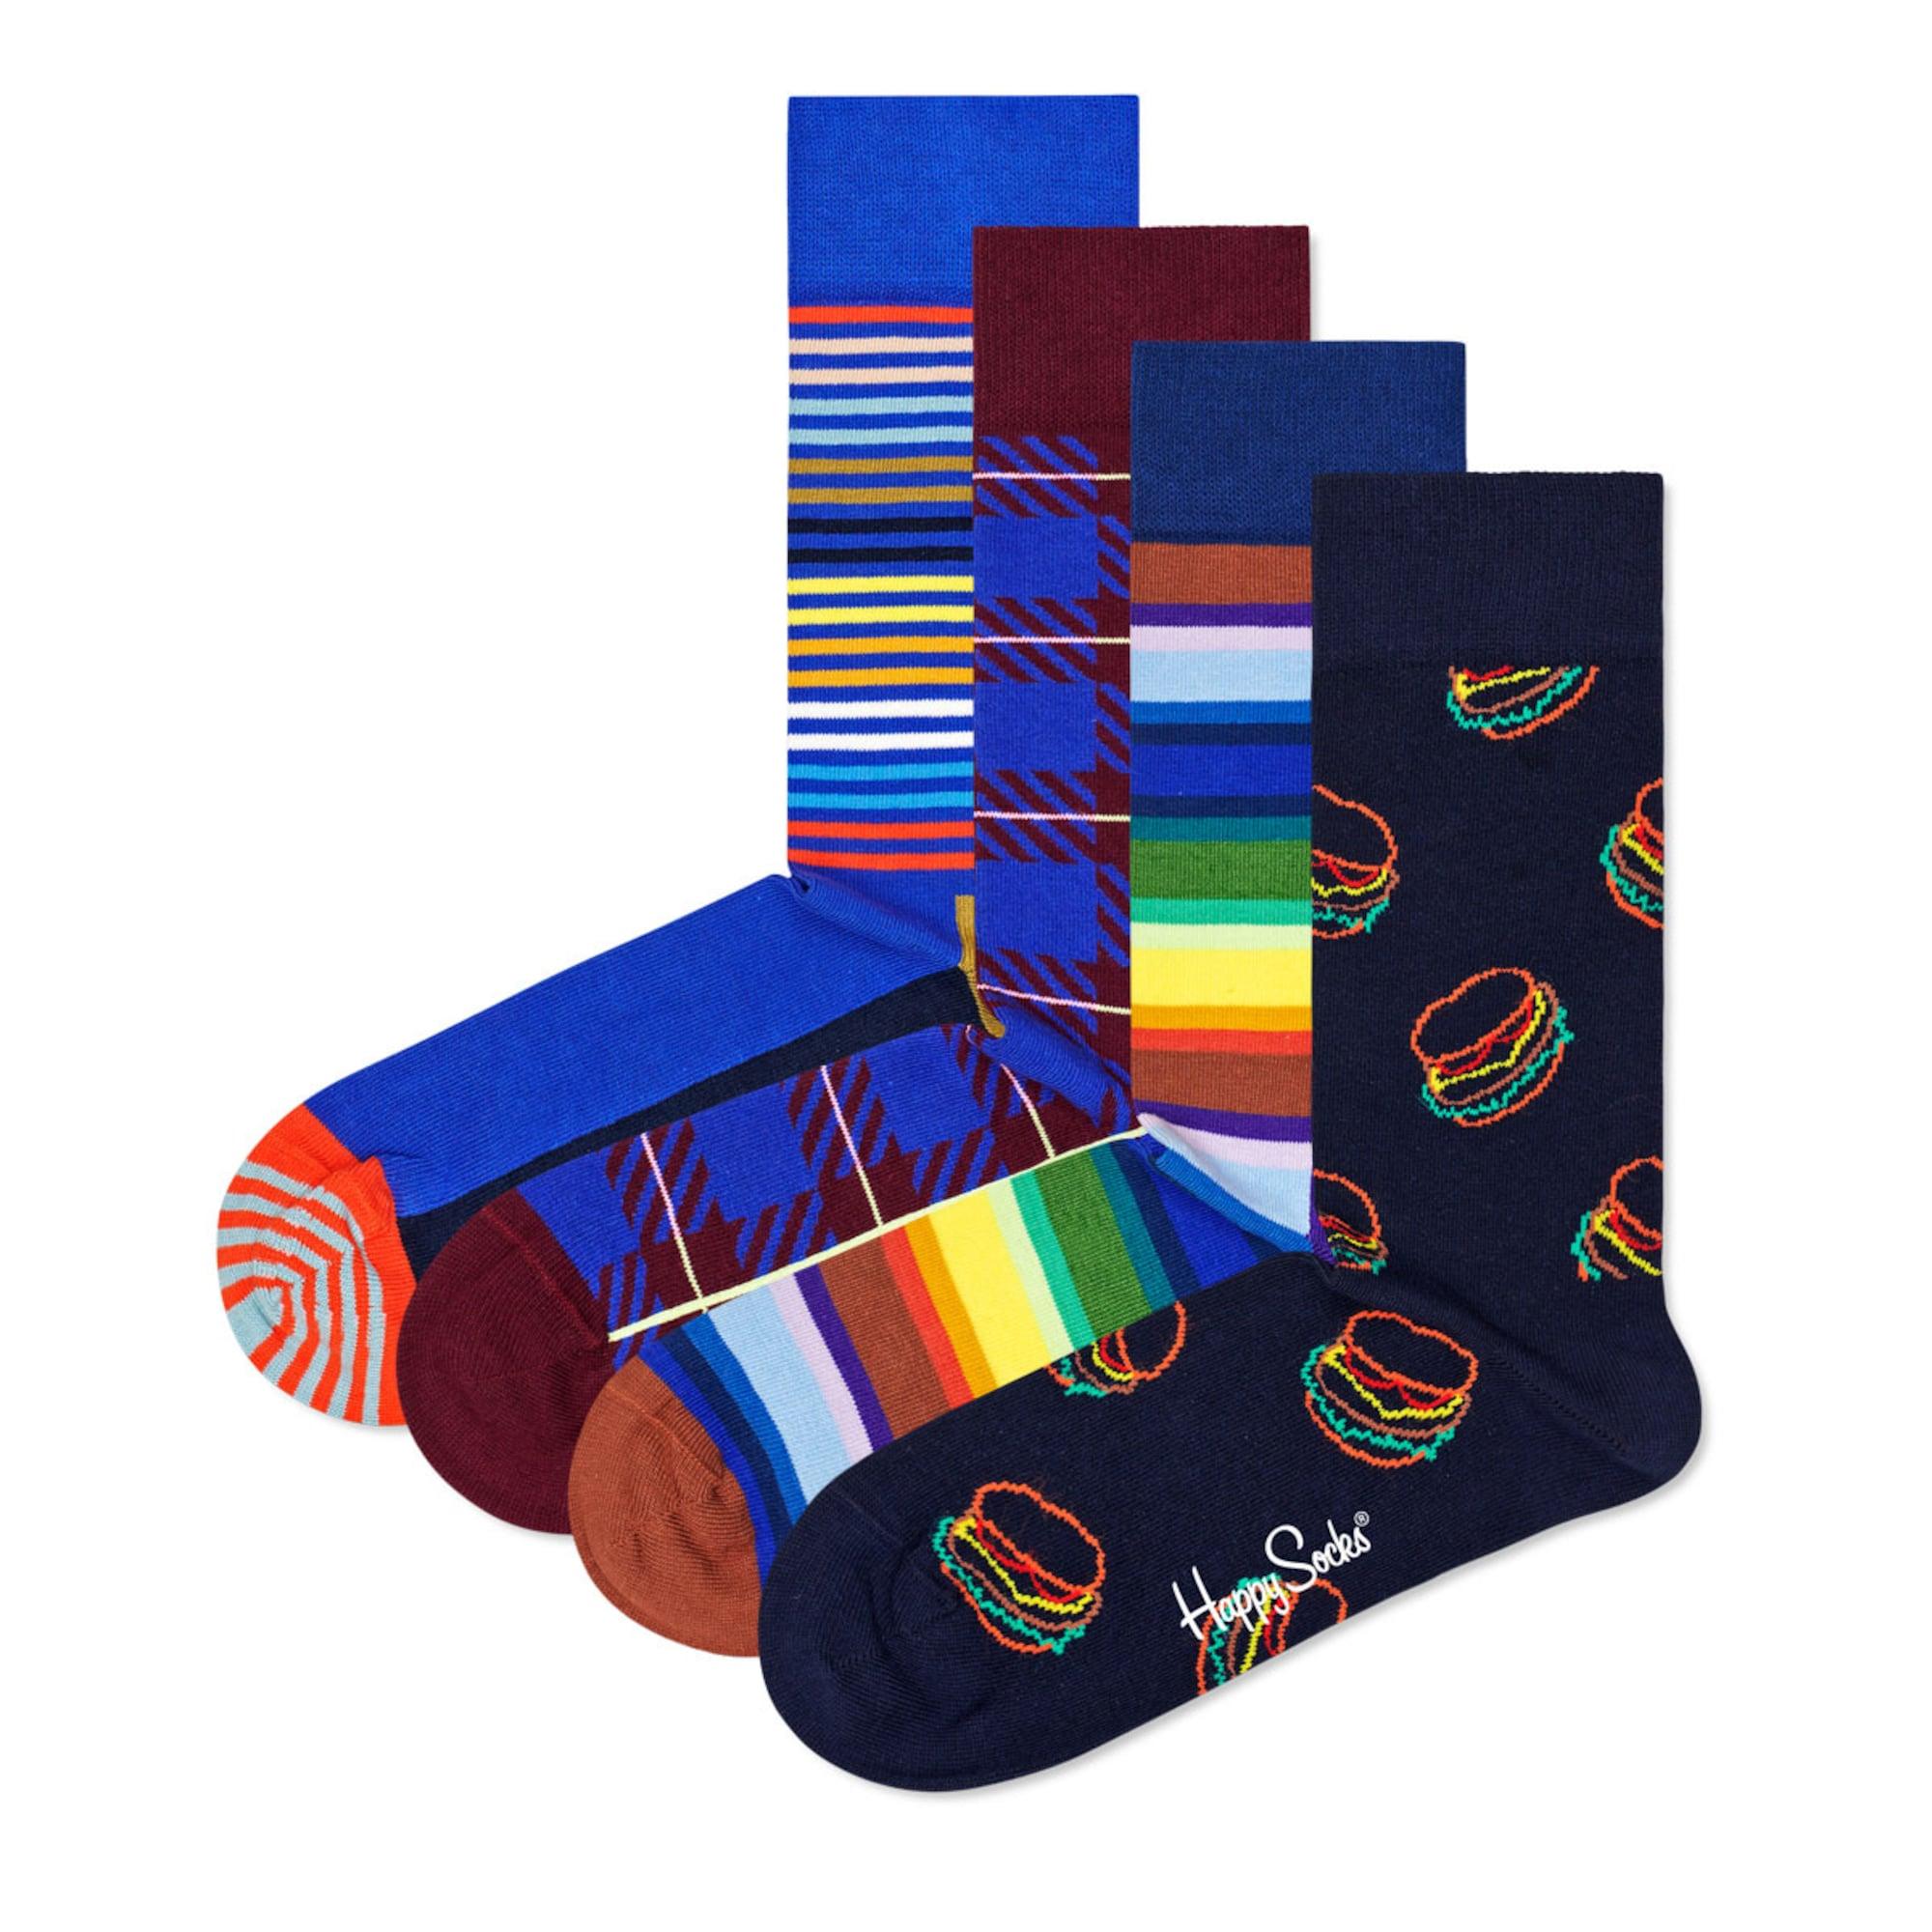 Happy Socks Kojinės mėlyna / nakties mėlyna / vyšninė spalva / mišrios spalvos